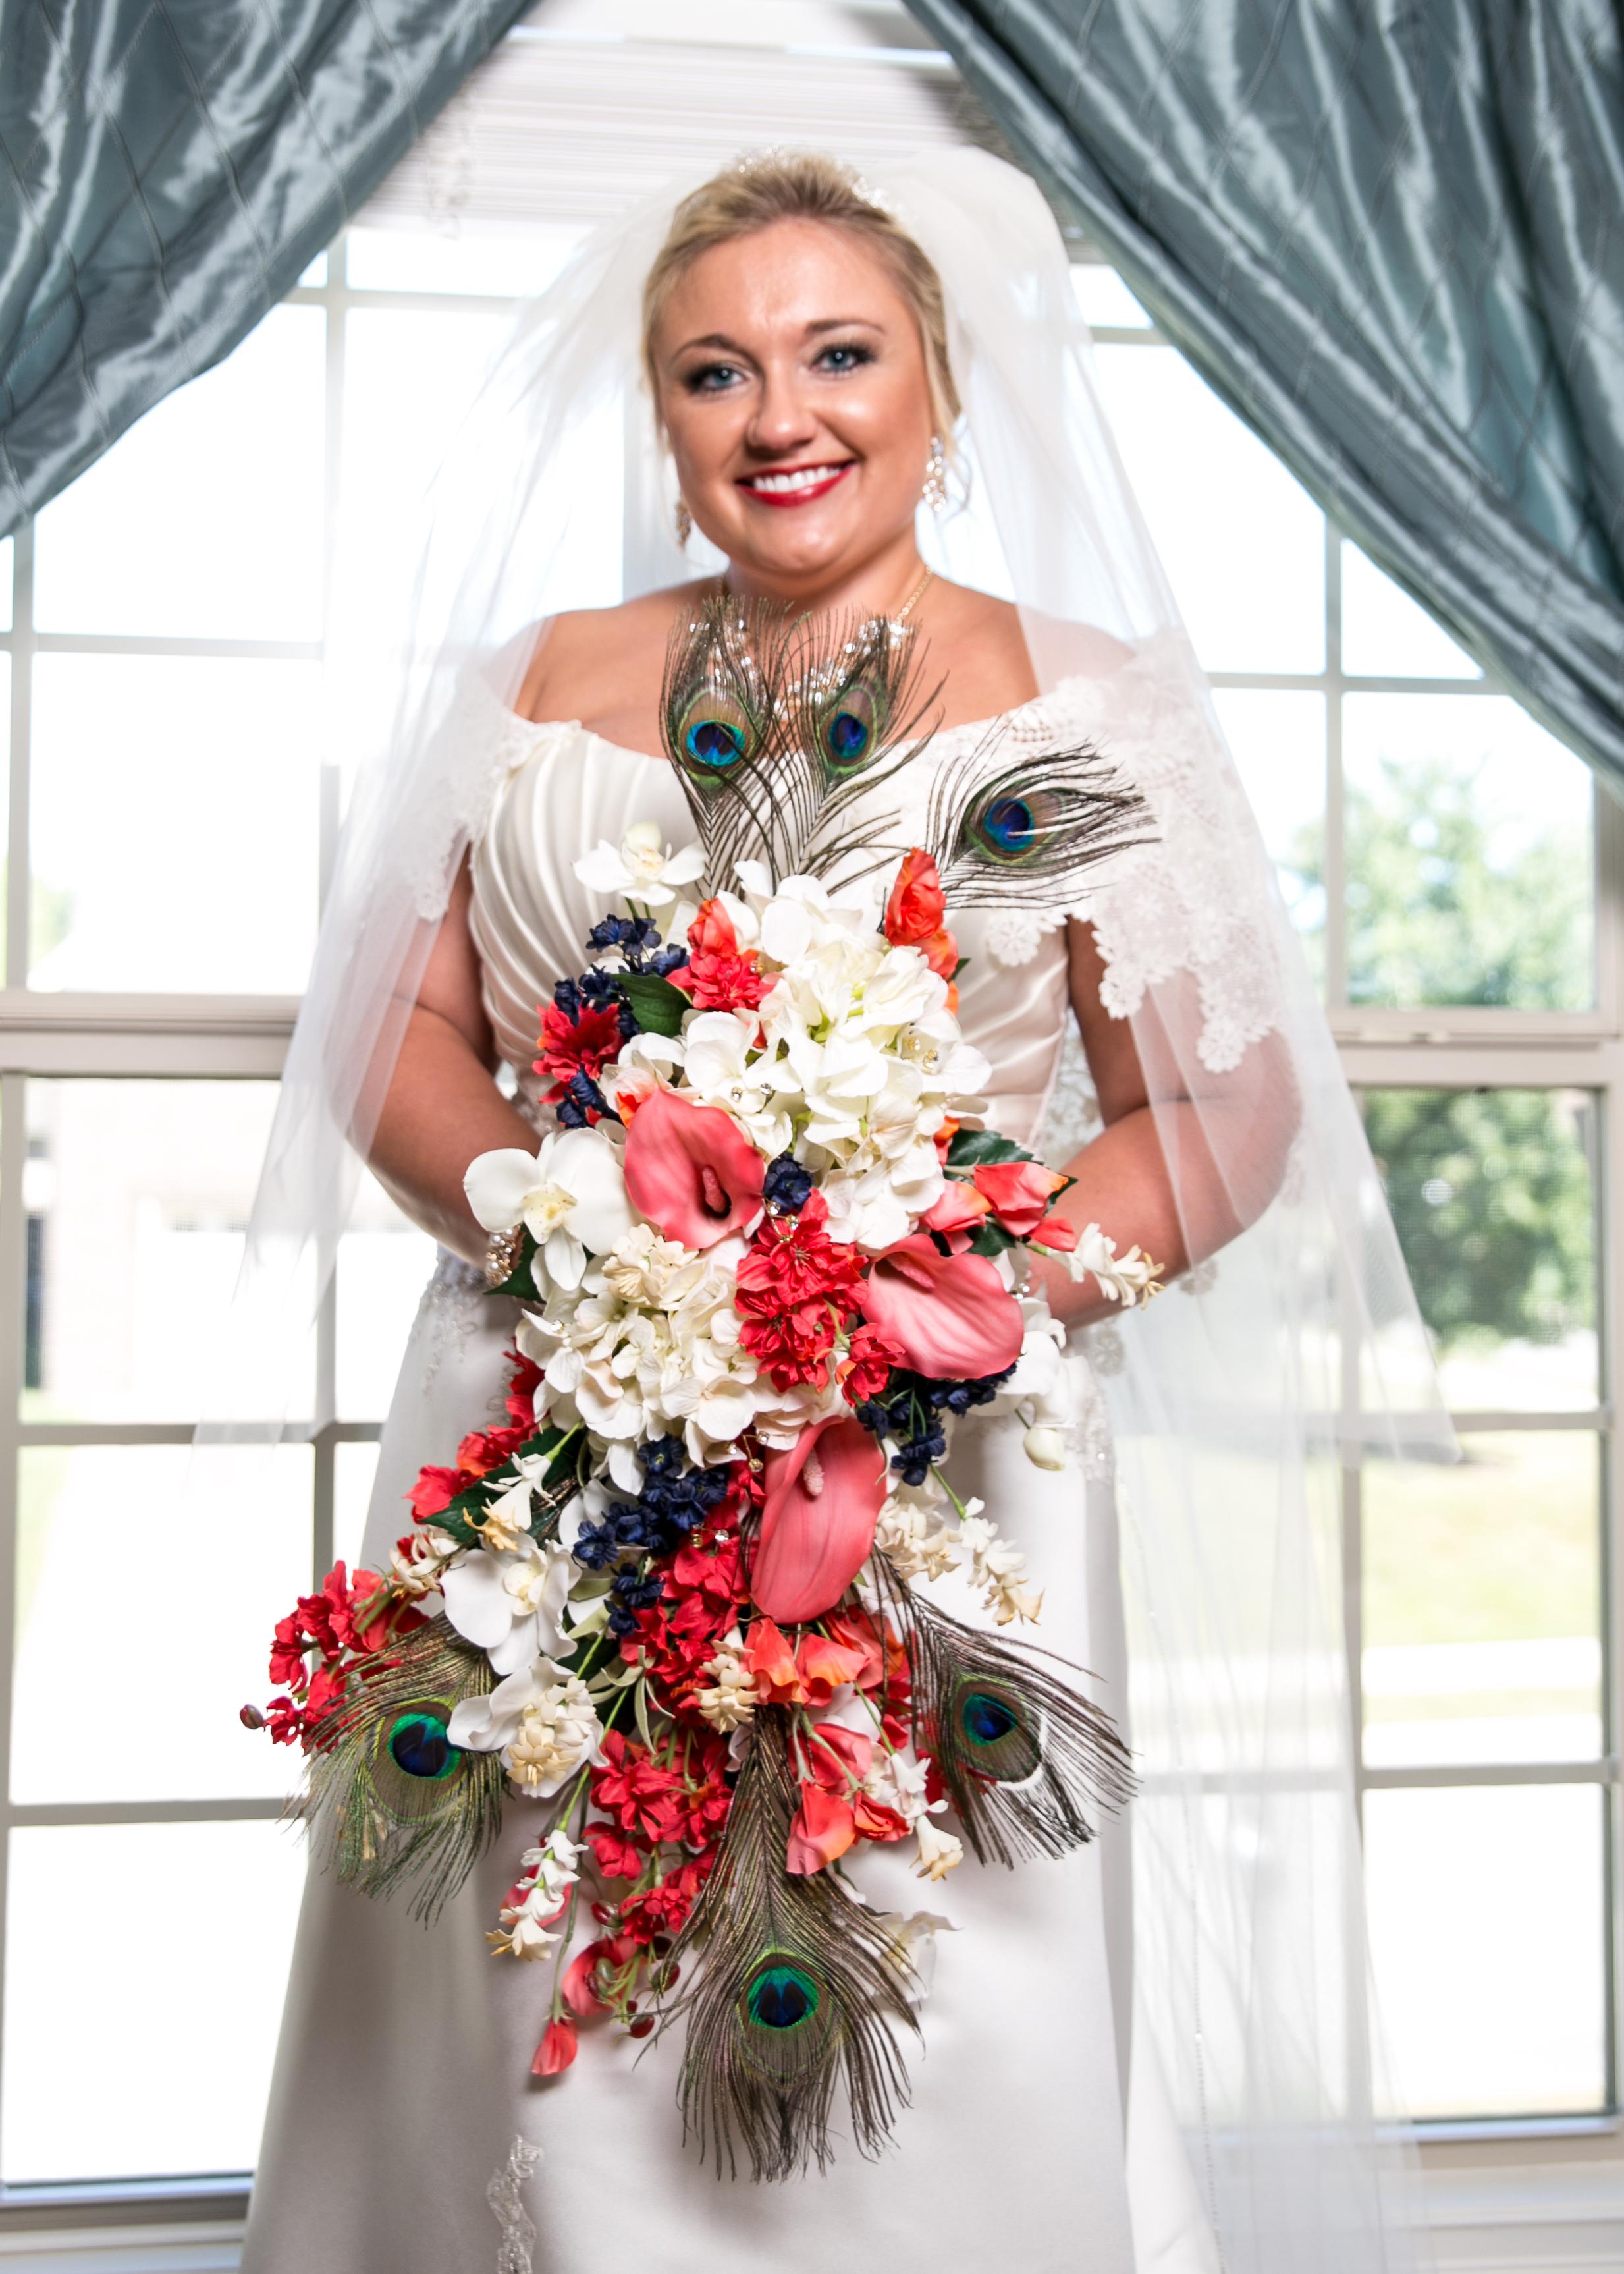 Nashville_Wedding_Photographers_DJ_Lighting_Bowling_Franklin (5 of 51).jpg